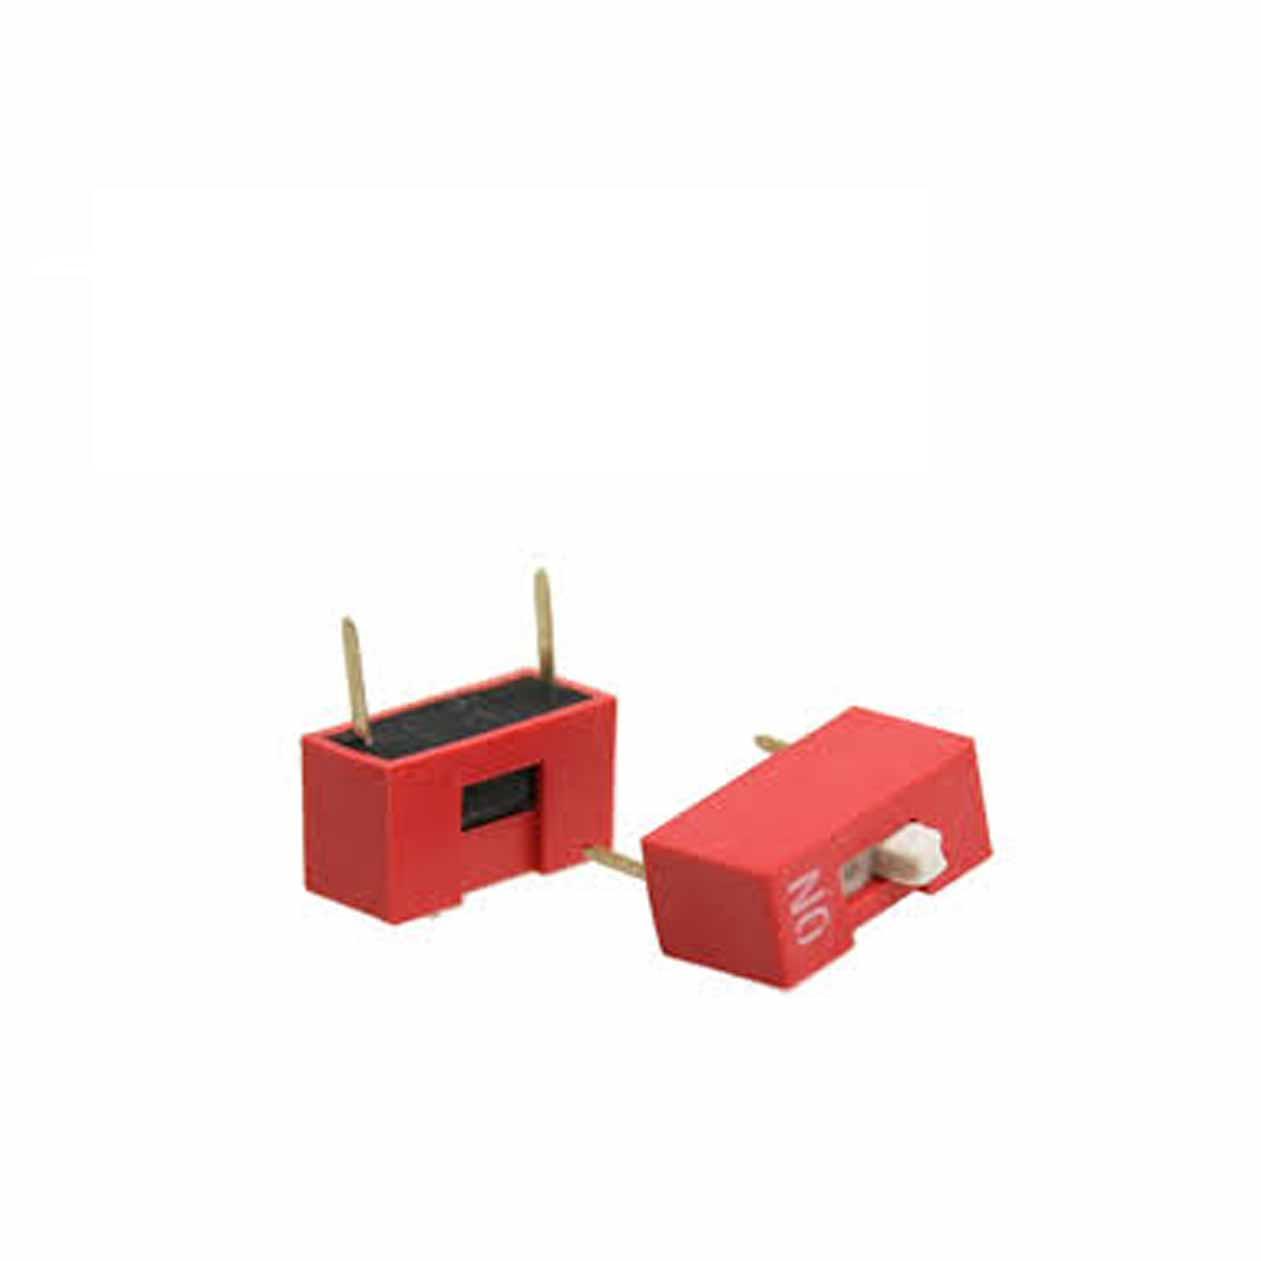 cong-tac-bit-1p-2-54mm